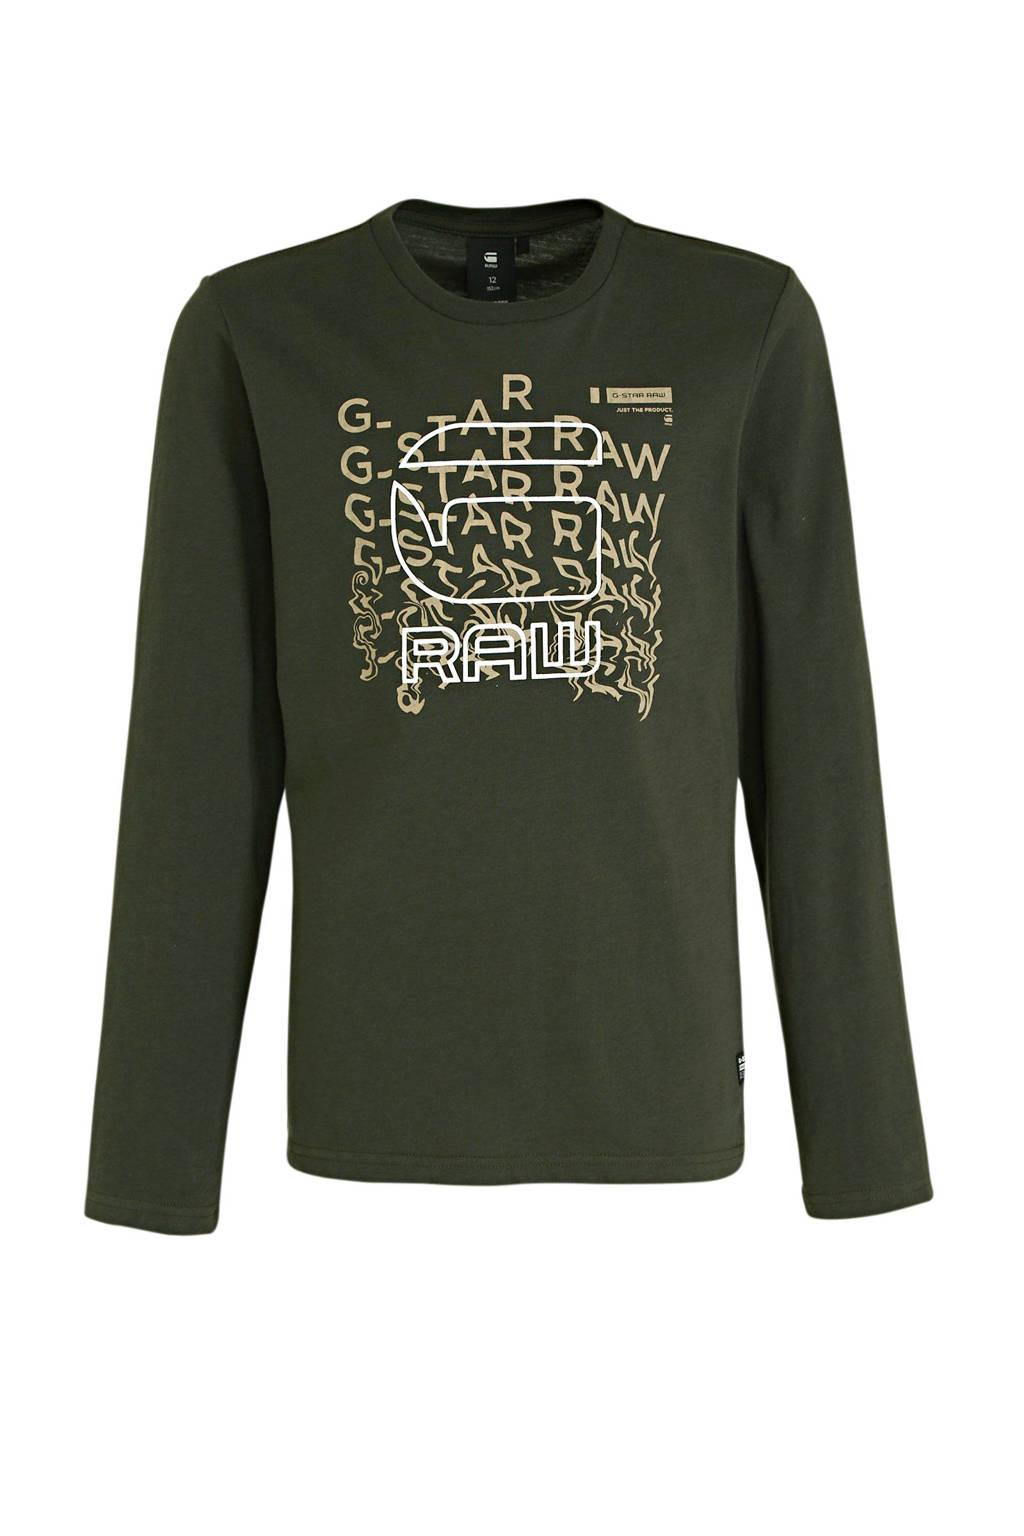 G-Star RAW longsleeve met logo donkergroen, Donkergroen